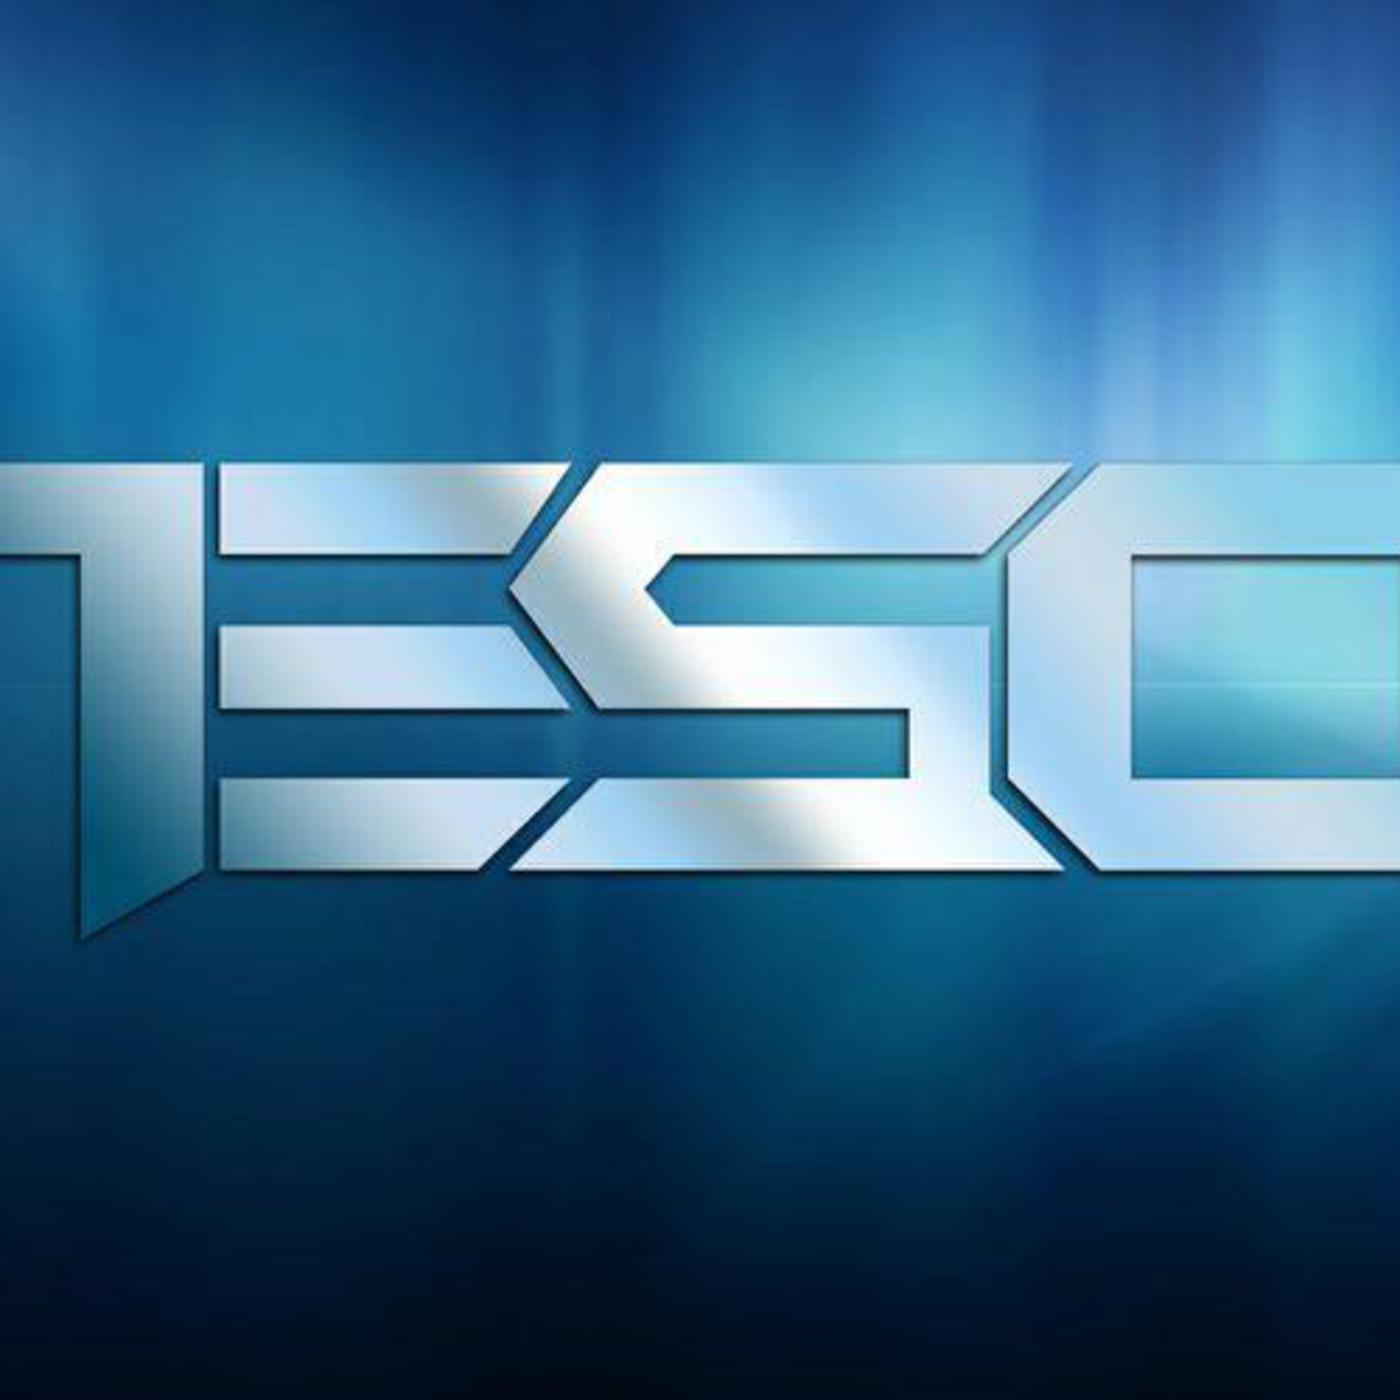 Teso - Adrenaline Journey Radio - Episode 01